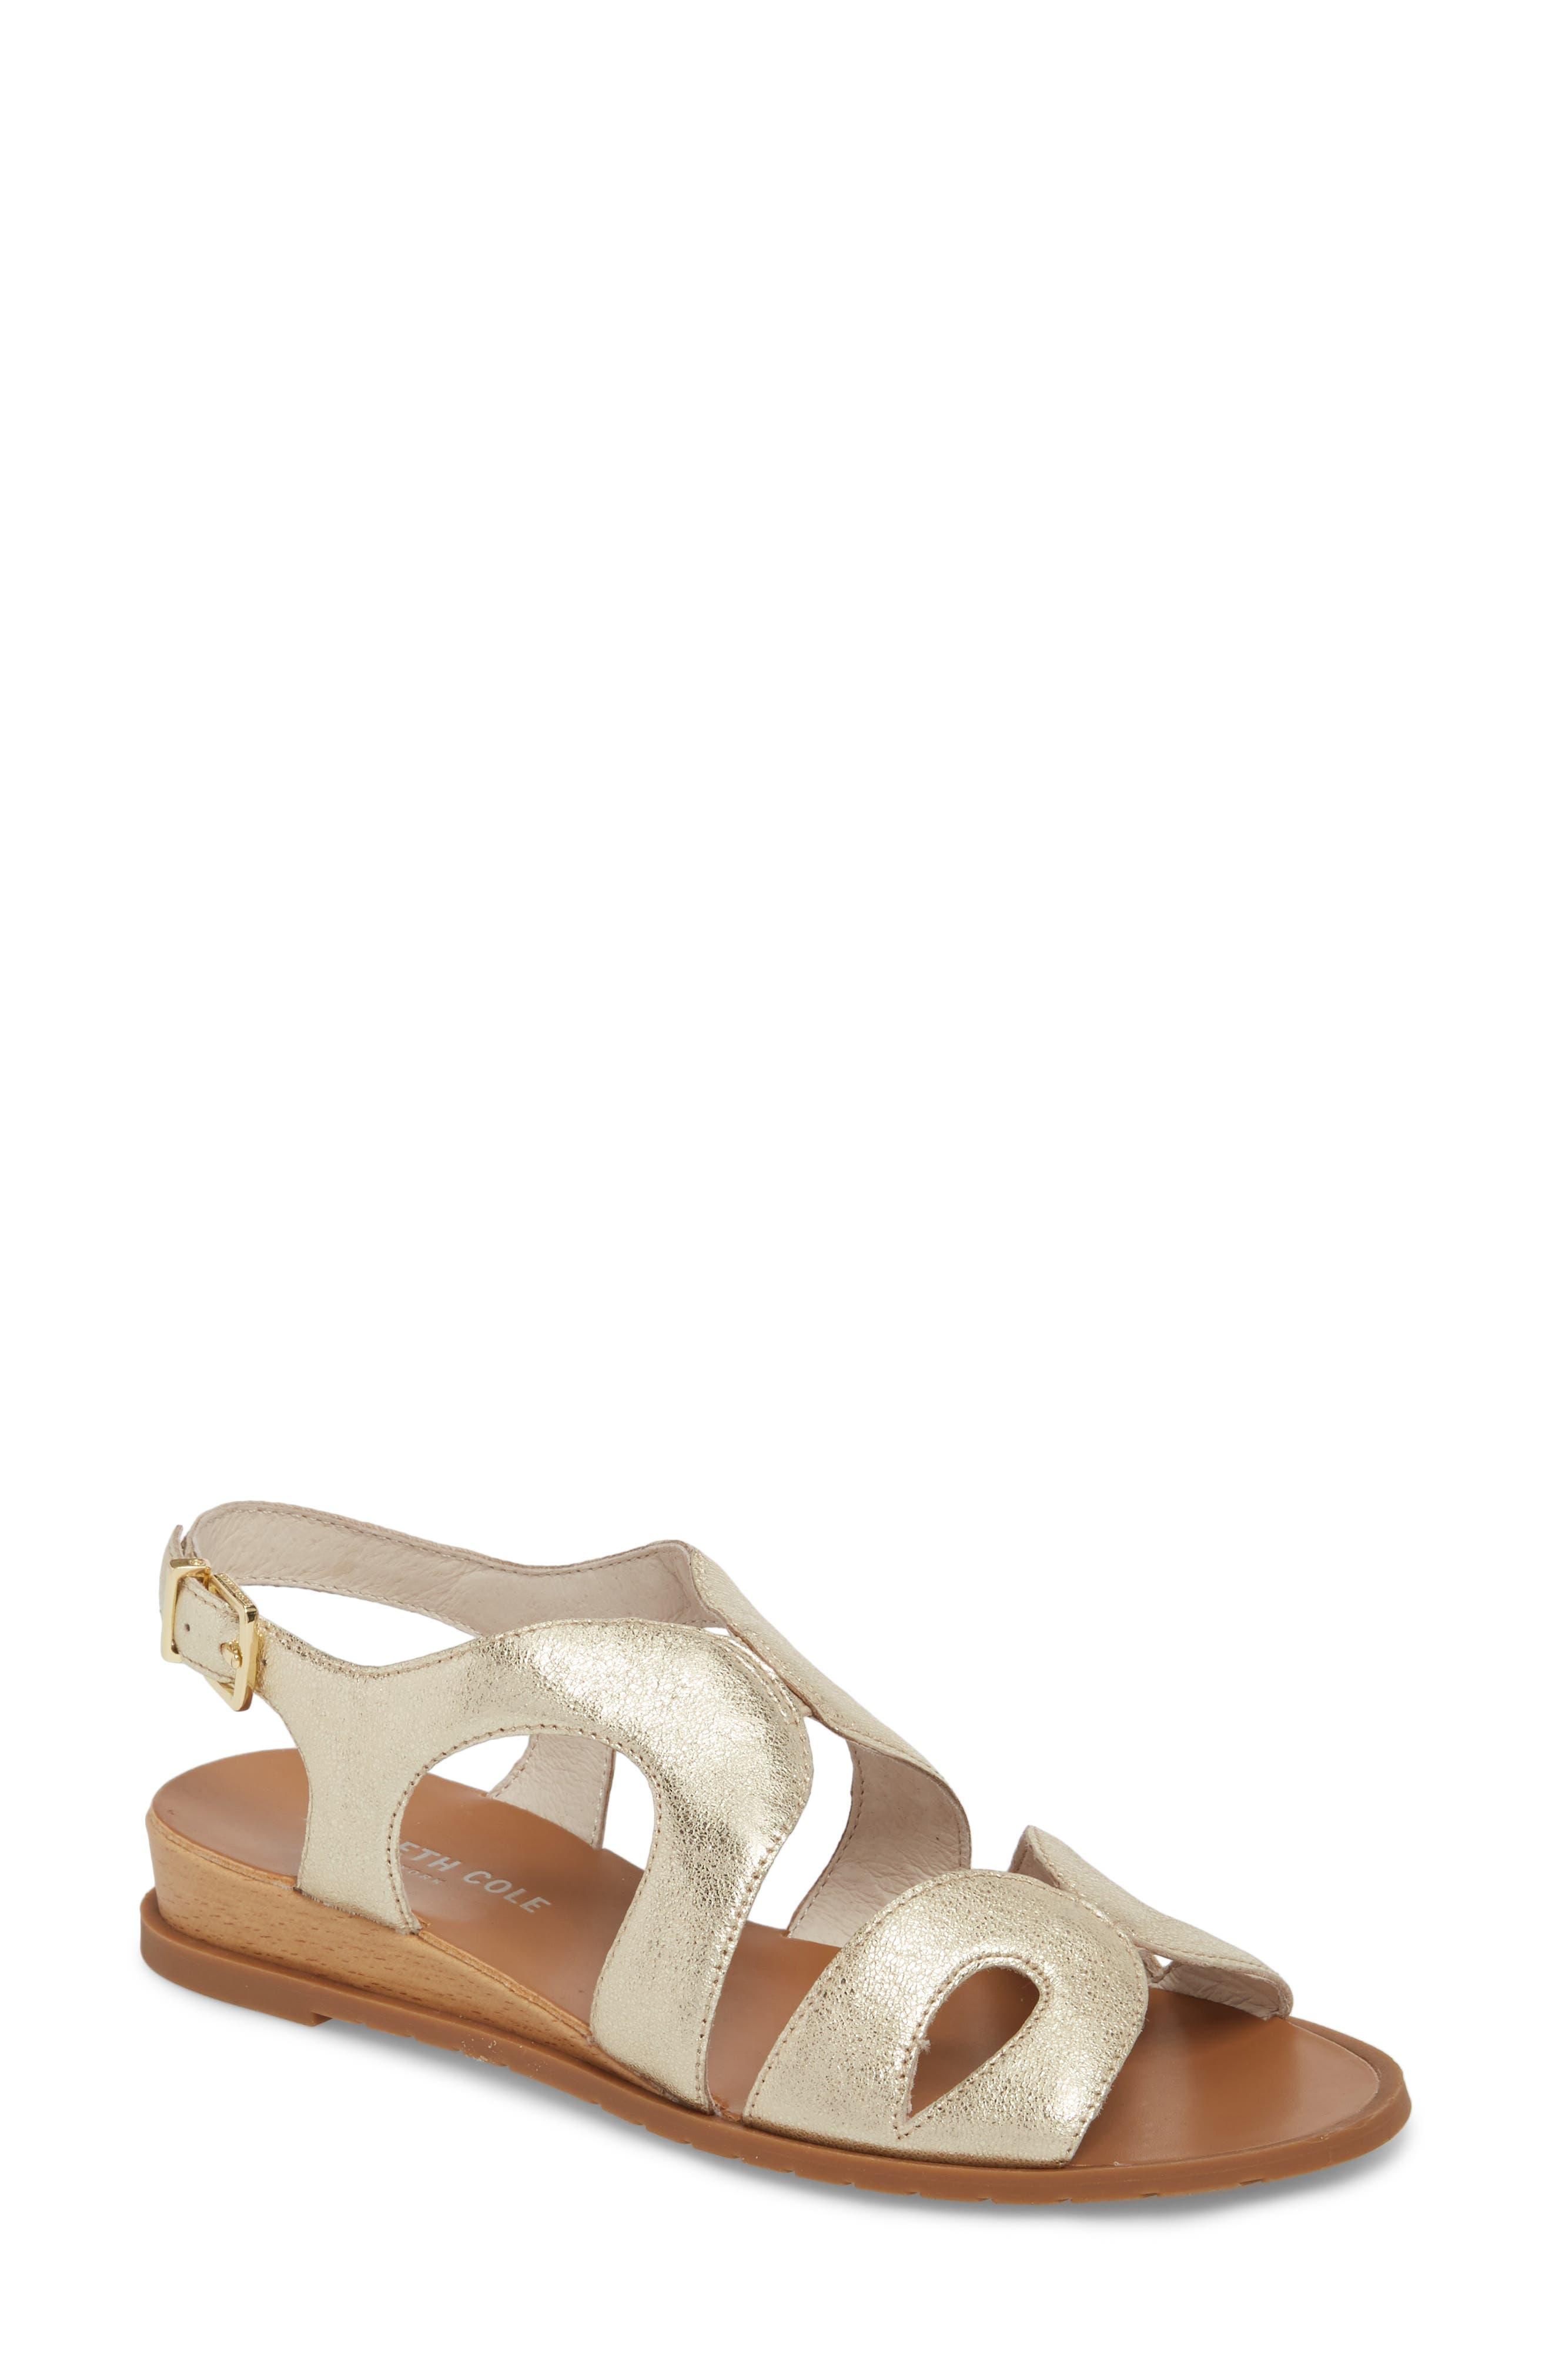 Jules Sandal,                             Main thumbnail 1, color,                             Soft Gold Metallic Leather